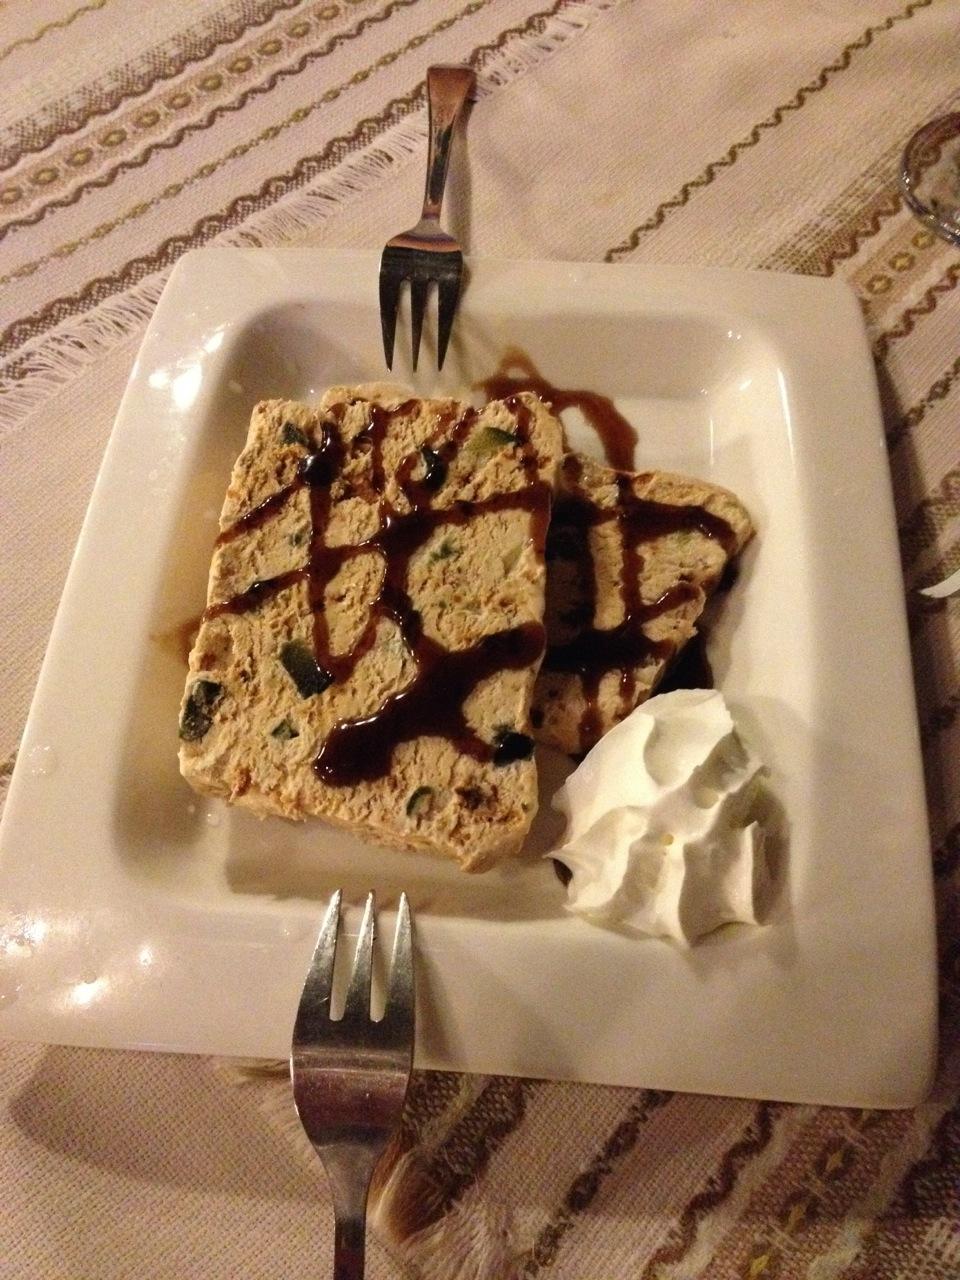 Fantastic dessert